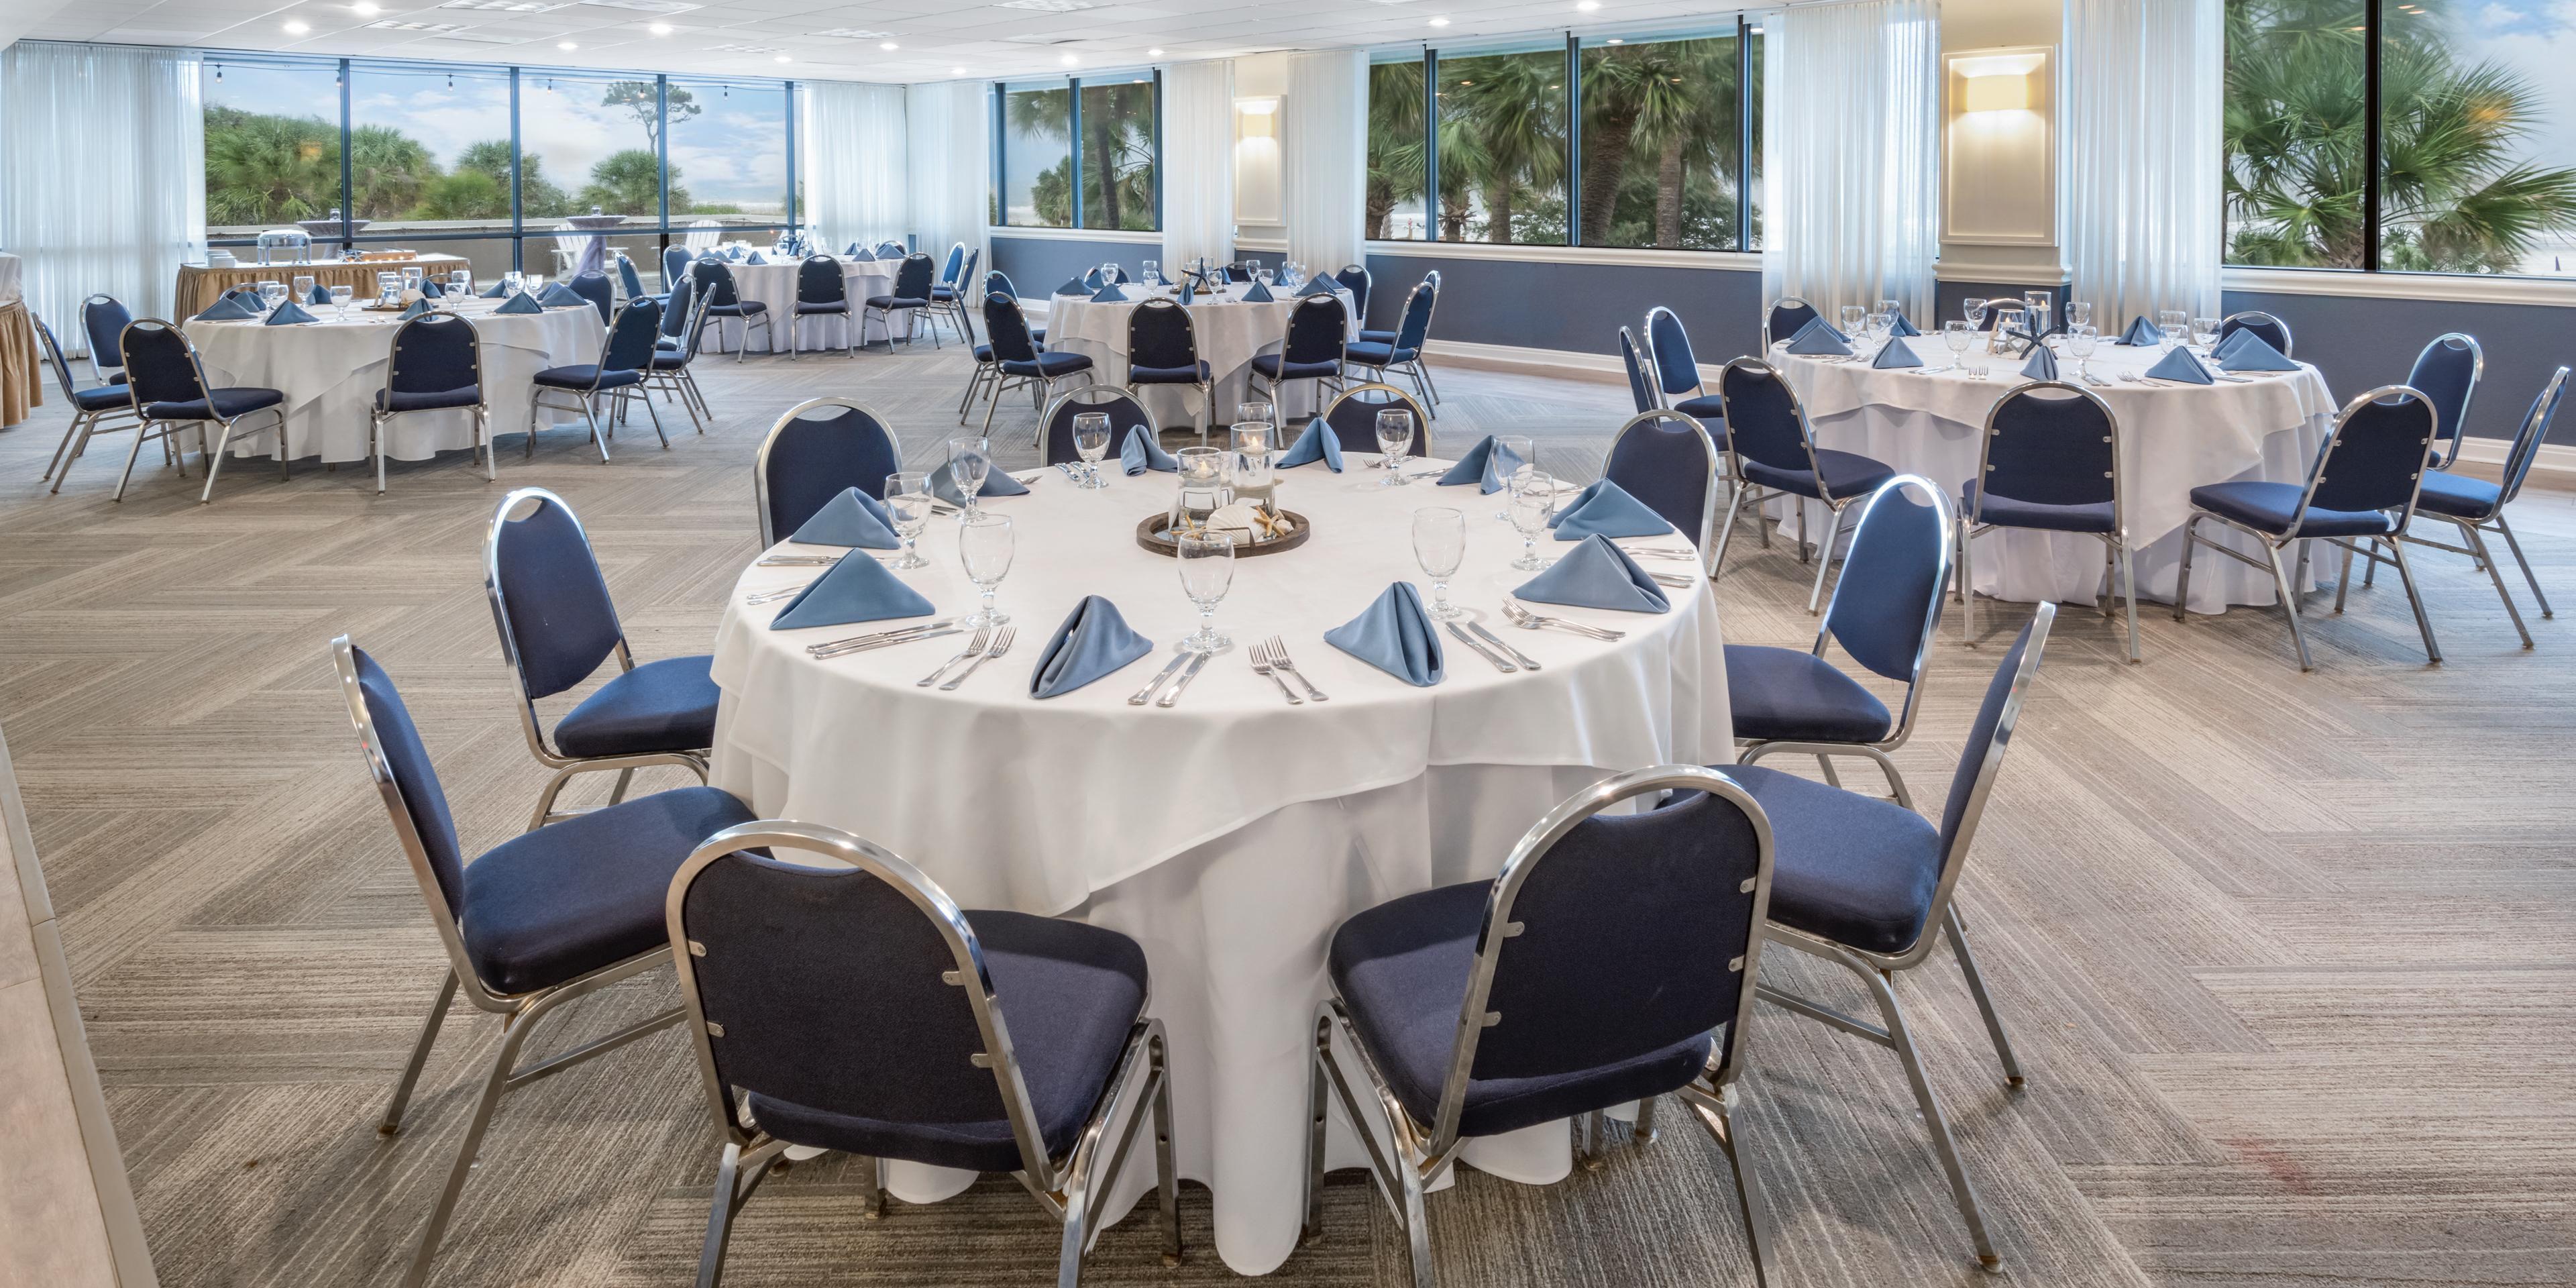 Hilton Head Christmas 2021 Caterers Oceanfront Hilton Head Resorts Holiday Inn Resort Beach House